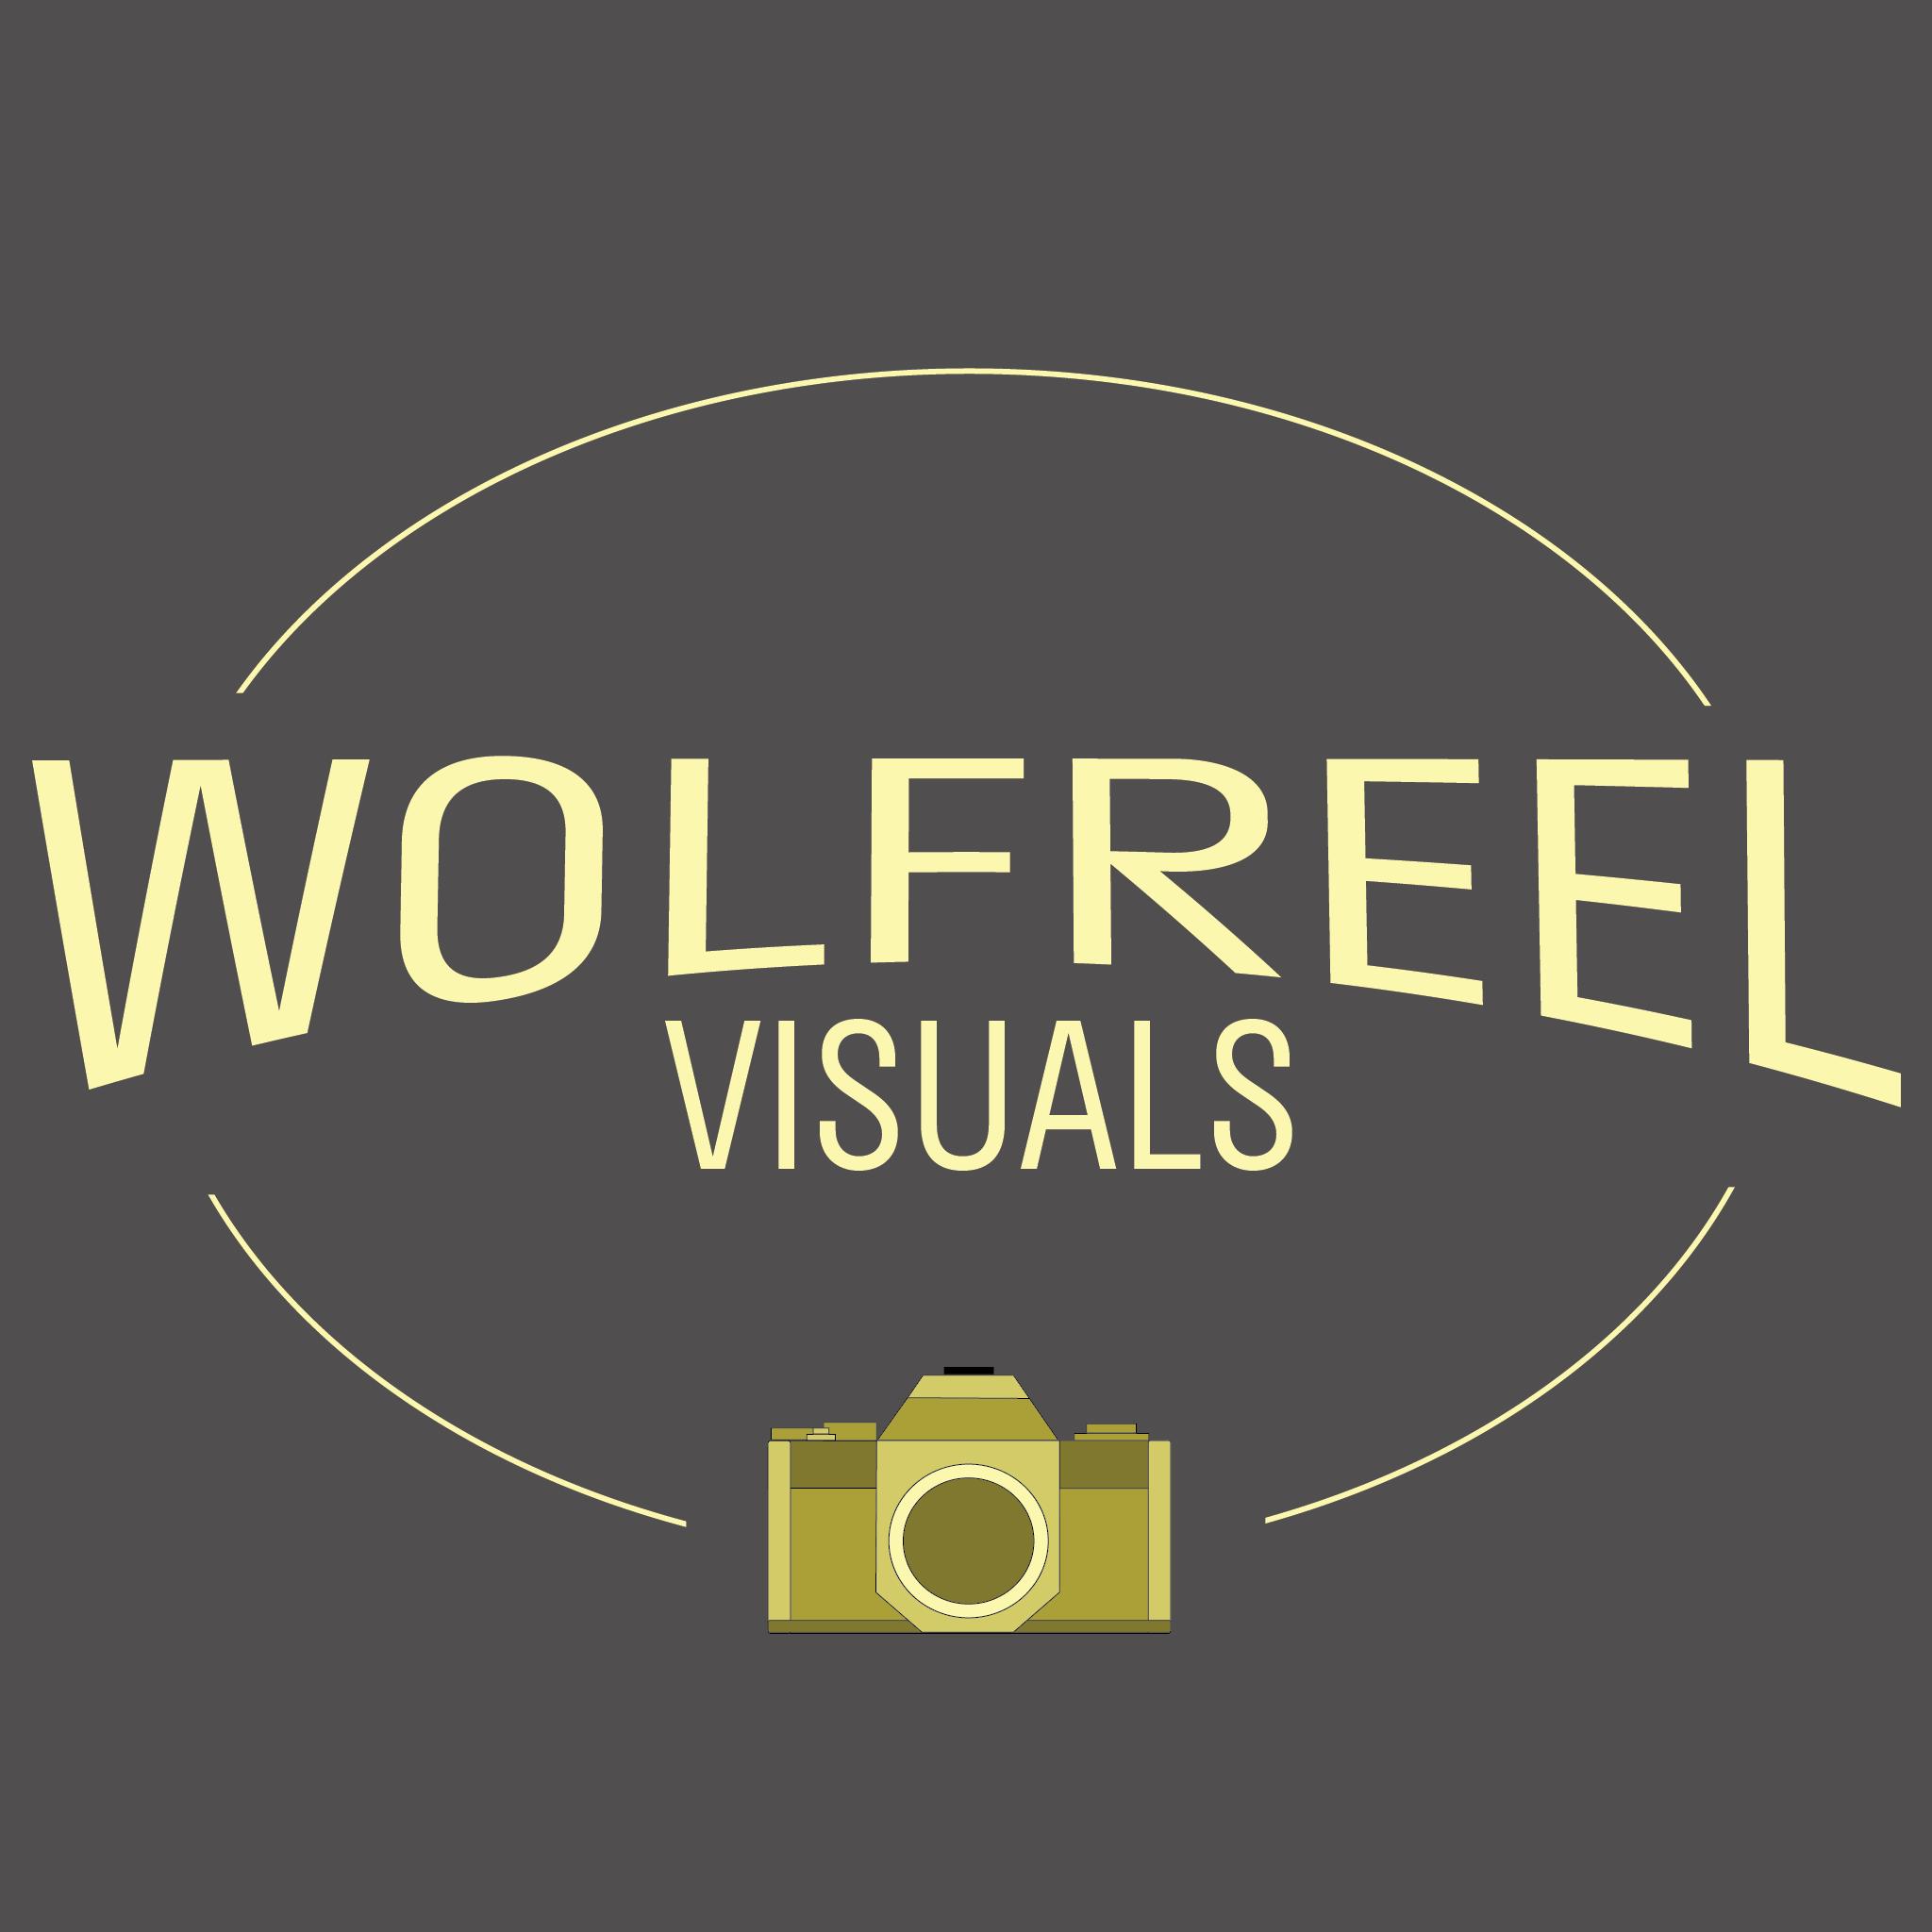 WolfReel Visuals